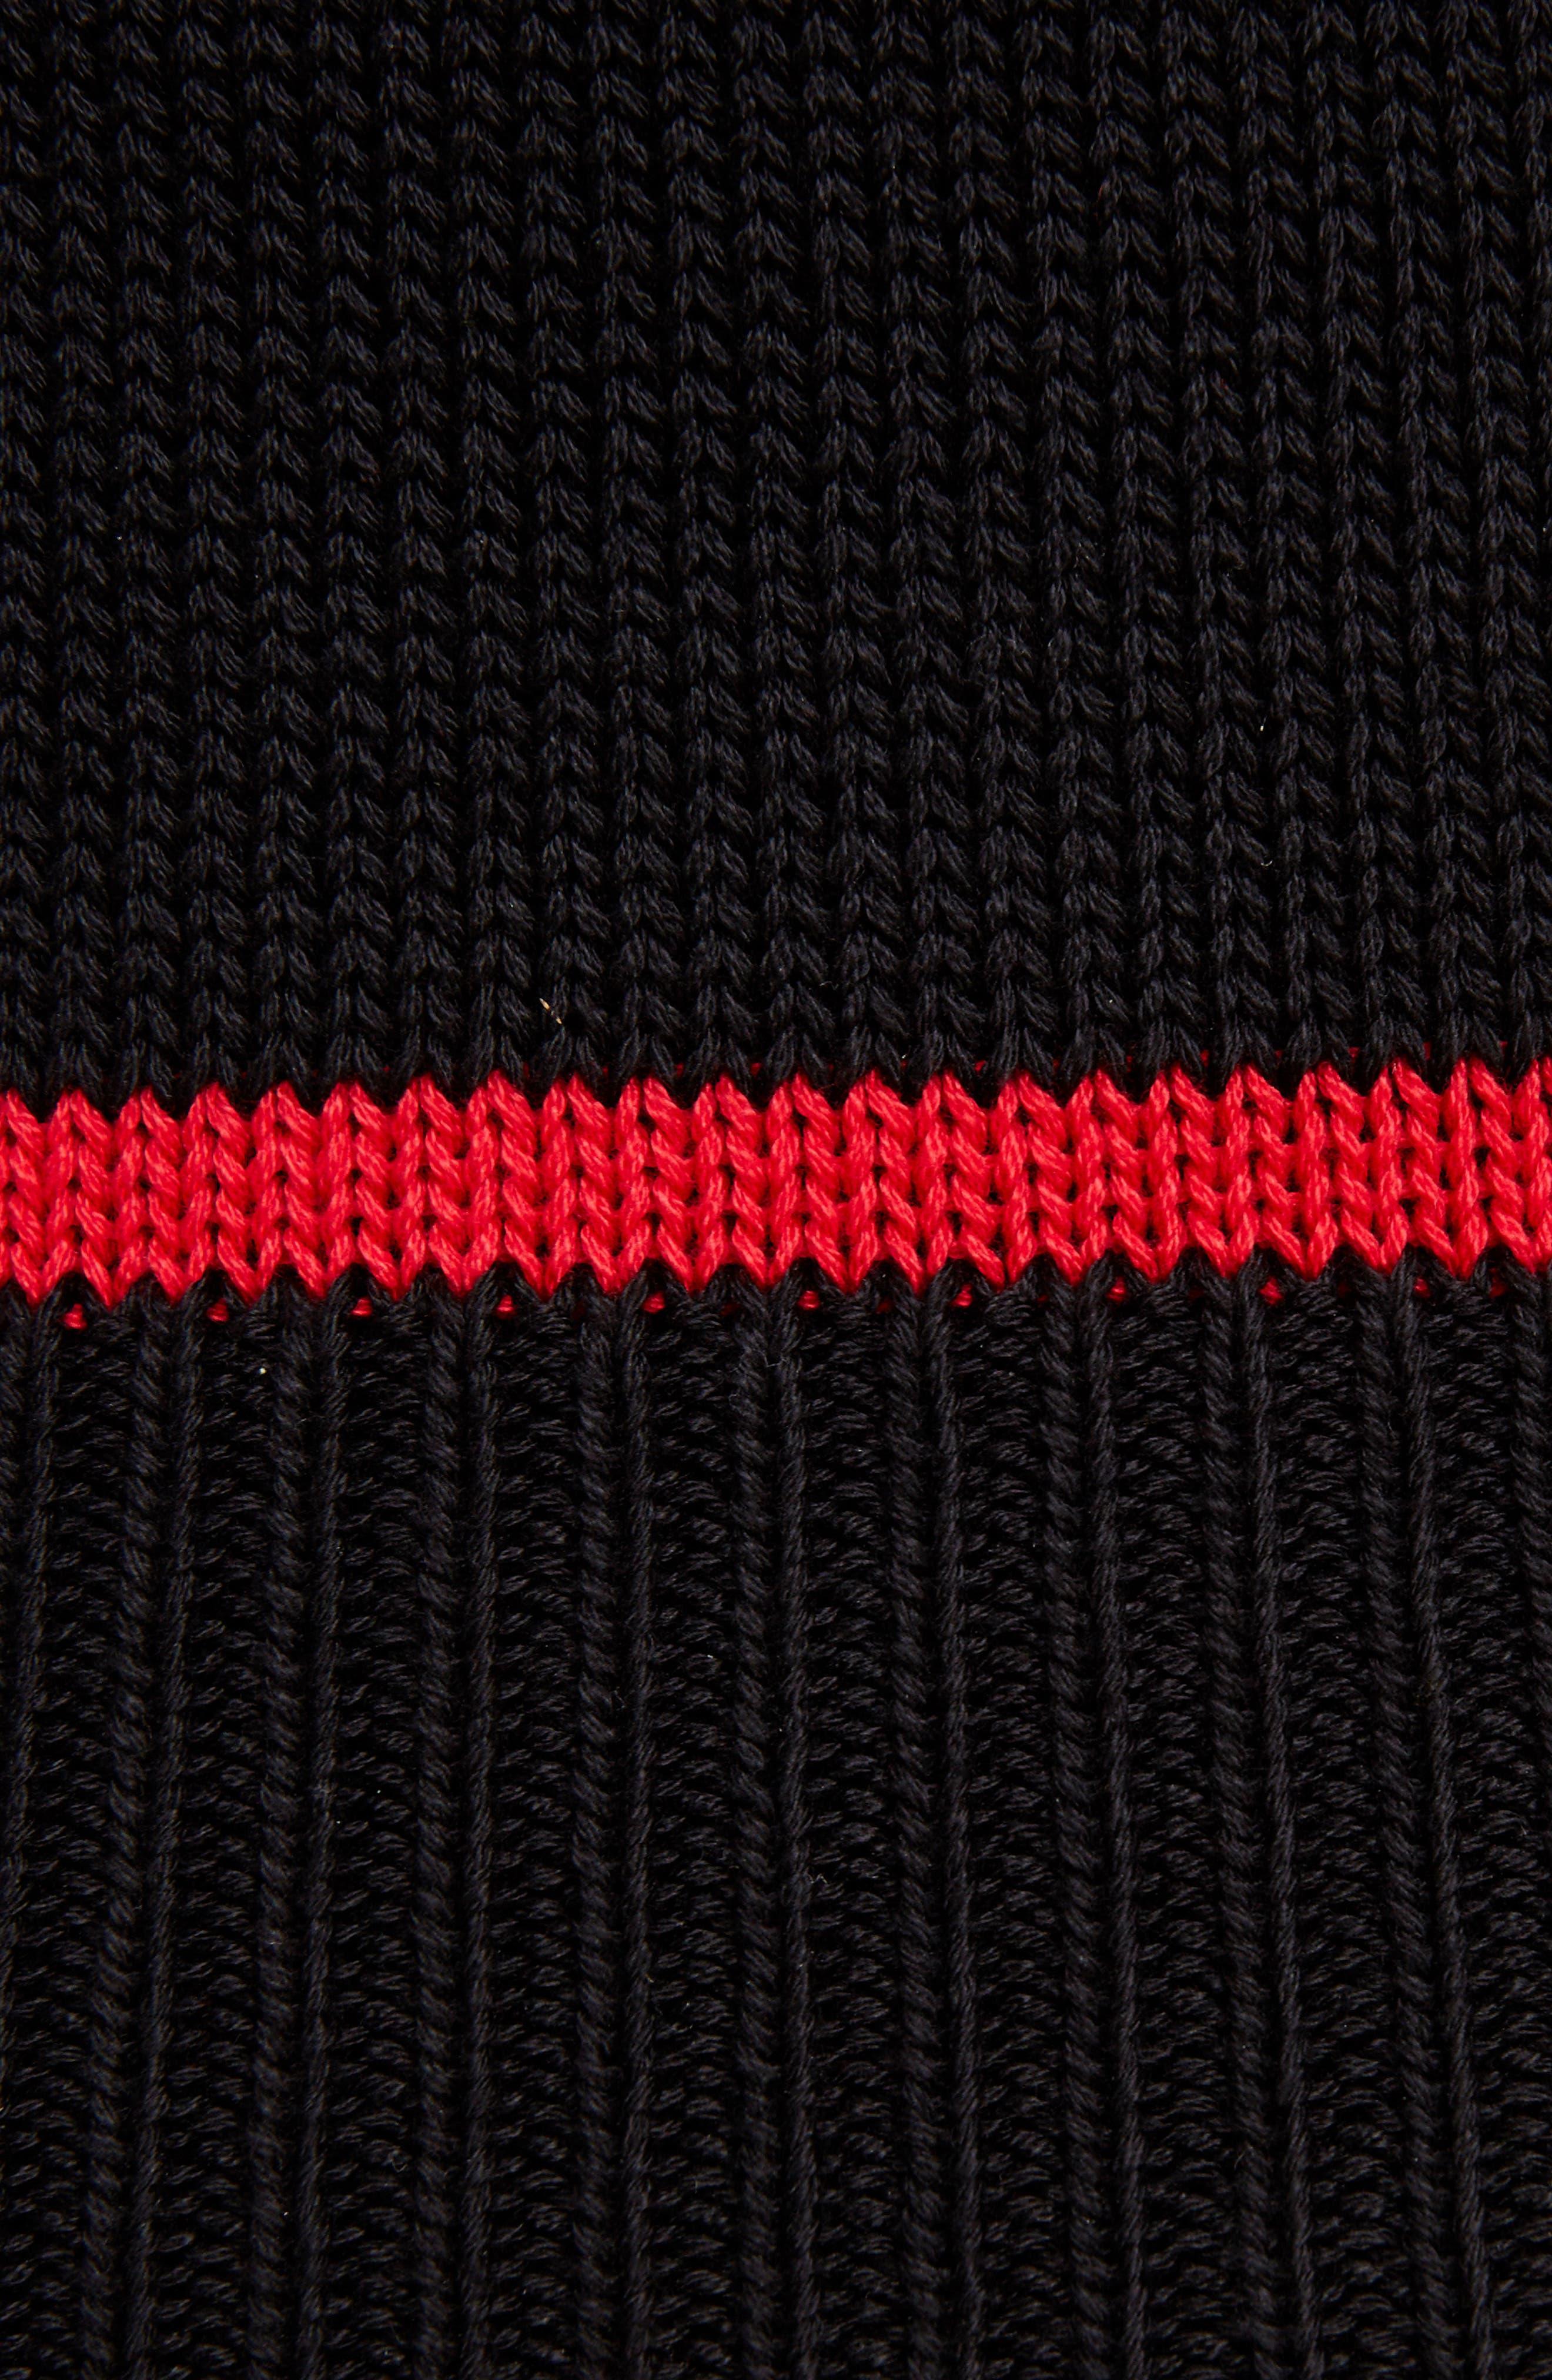 Crystal Embellished Knit Camisole,                             Alternate thumbnail 5, color,                             001